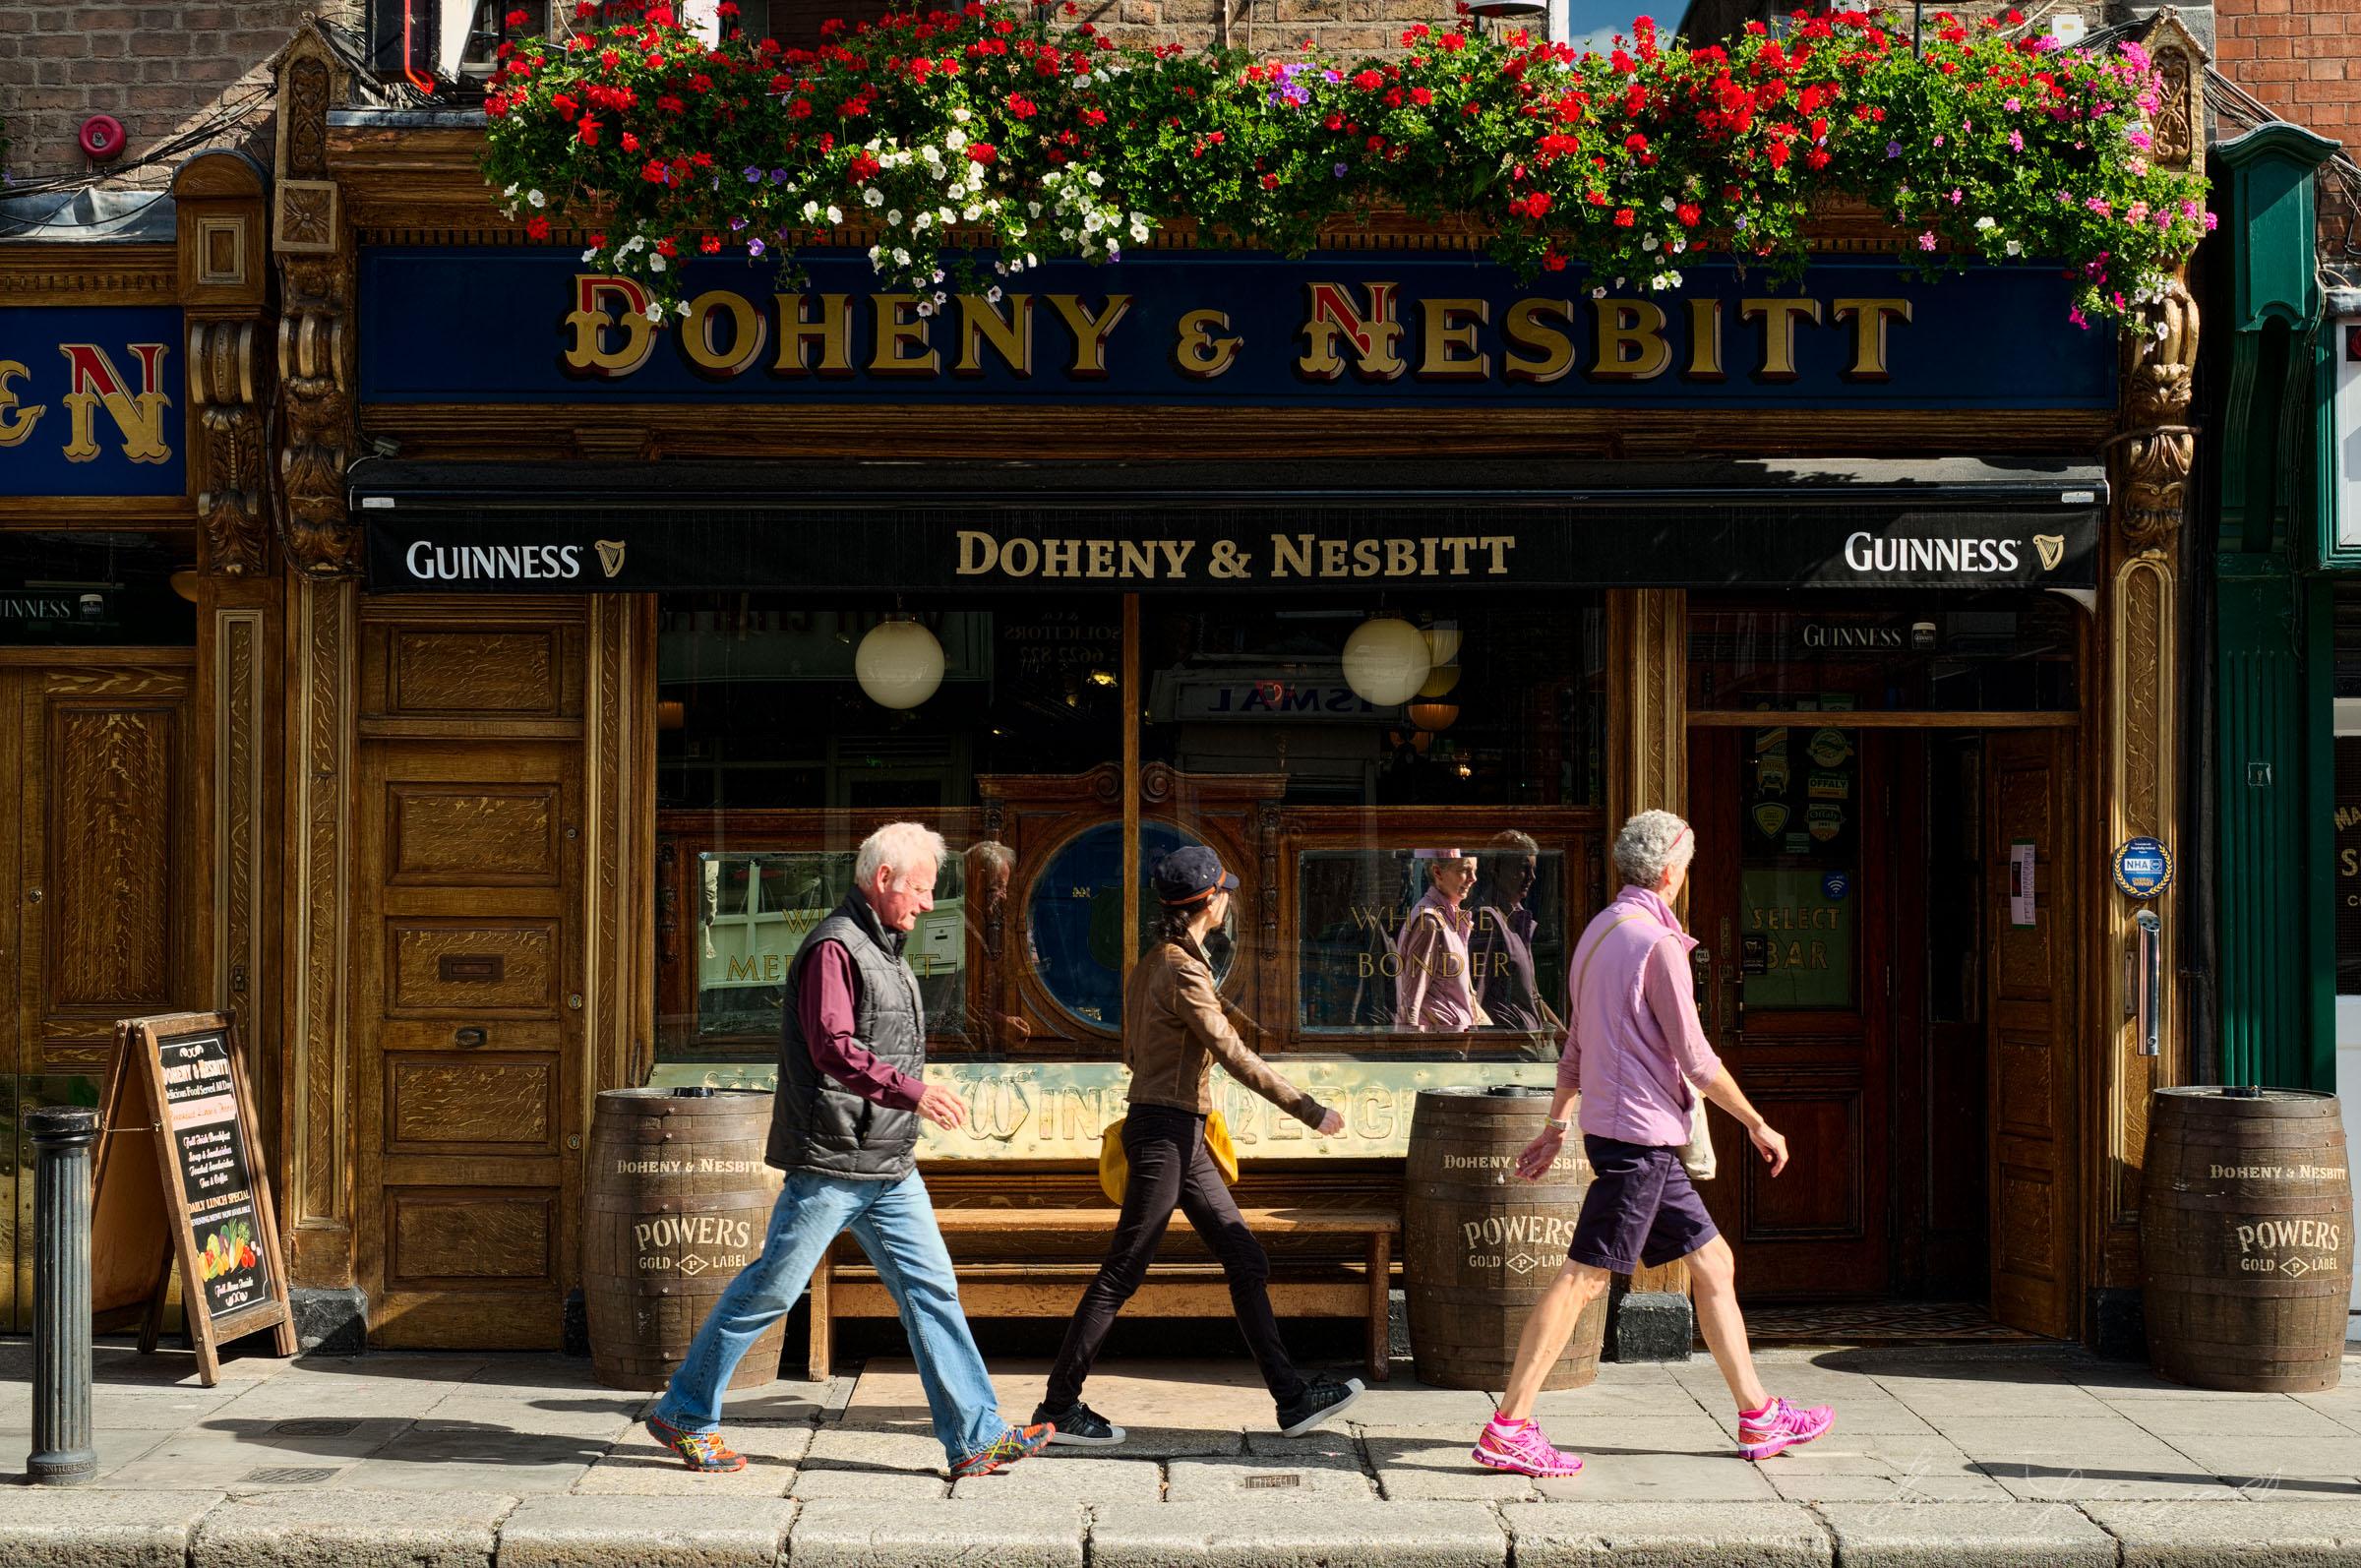 Streets-of-Dublin-Photo-1-6.jpg